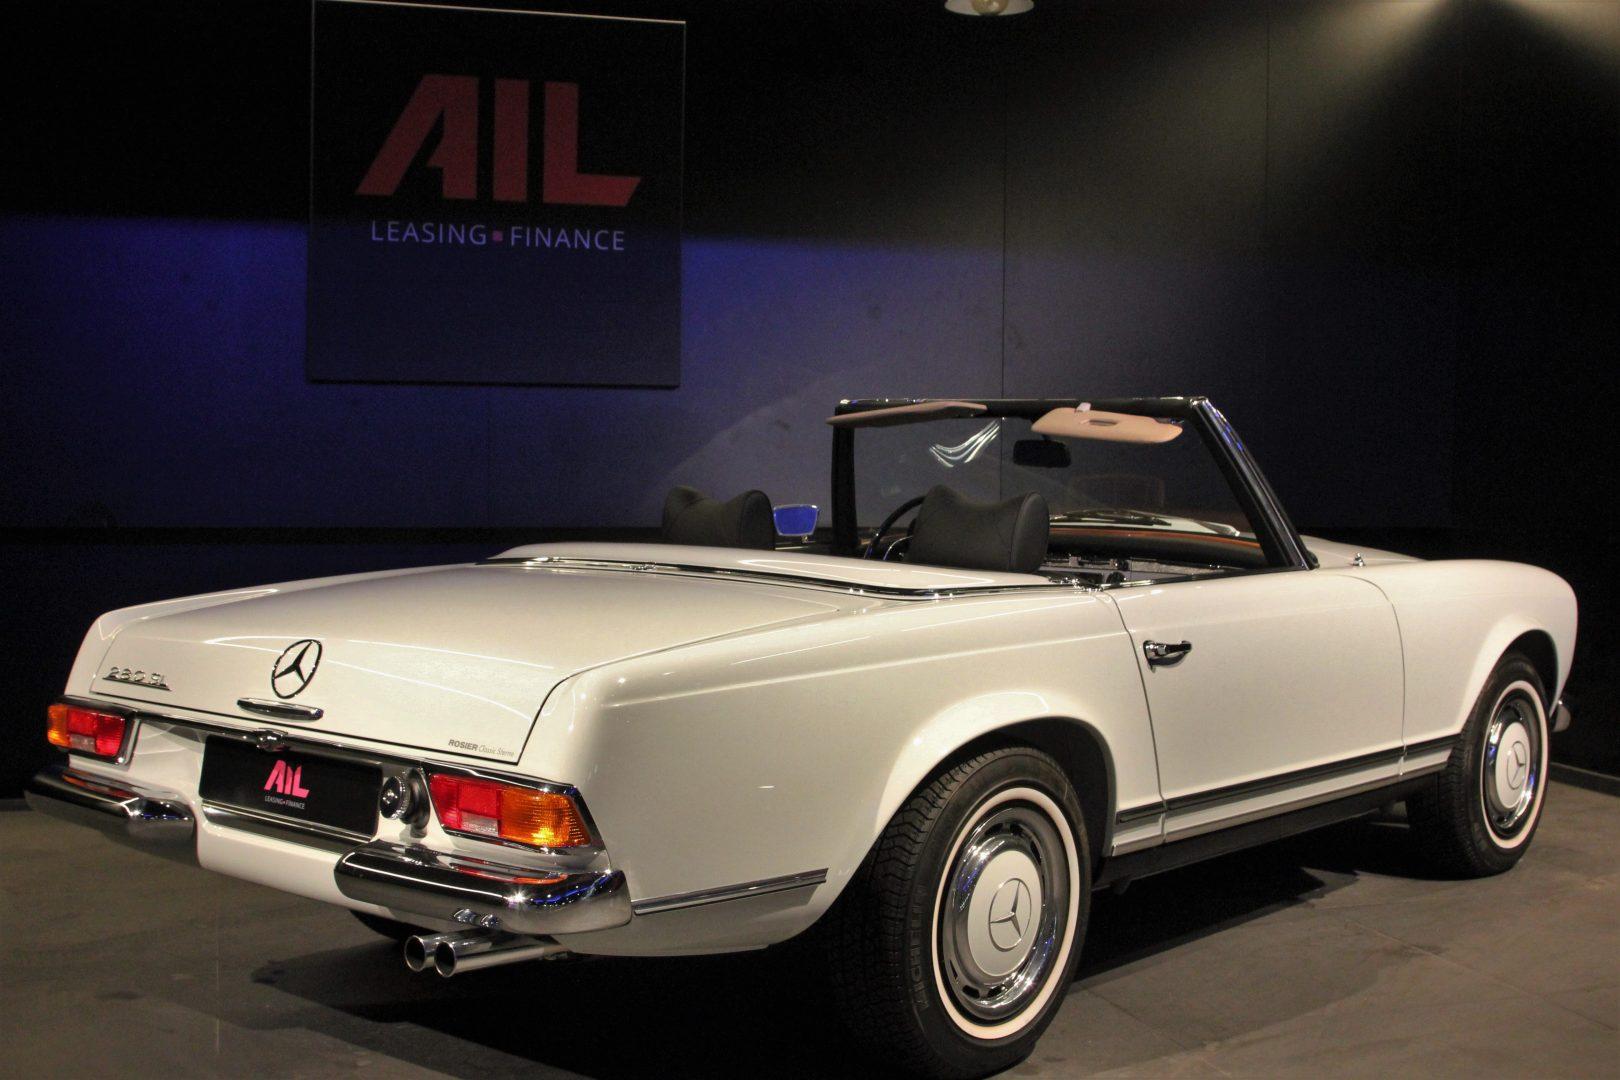 AIL Mercedes-Benz 280 SL Pagode Automatik 2